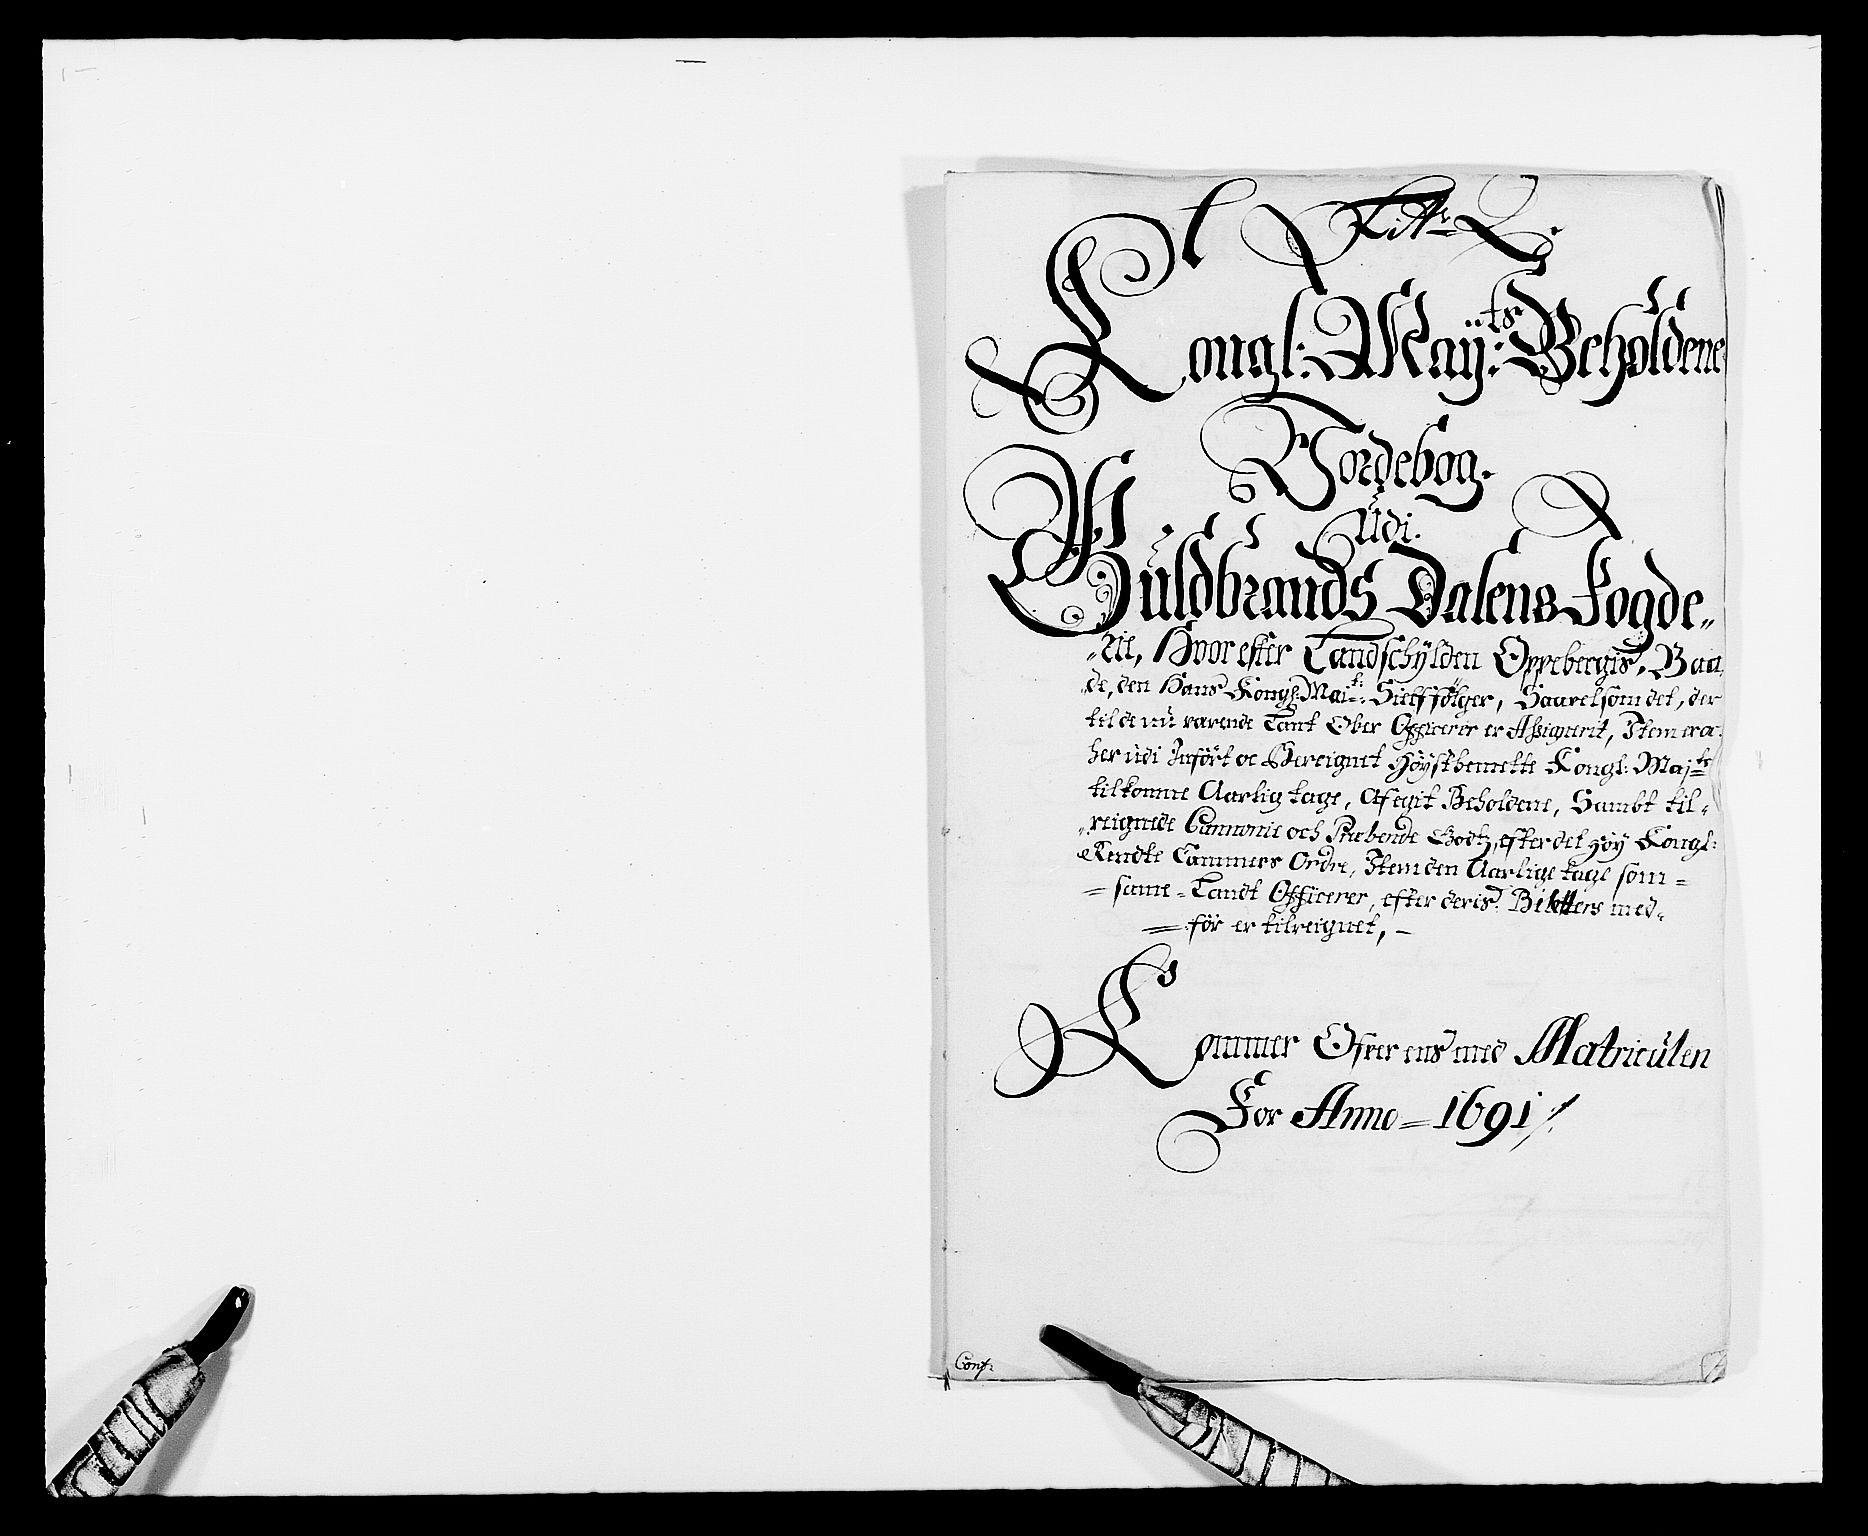 RA, Rentekammeret inntil 1814, Reviderte regnskaper, Fogderegnskap, R17/L1165: Fogderegnskap Gudbrandsdal, 1690-1692, s. 280